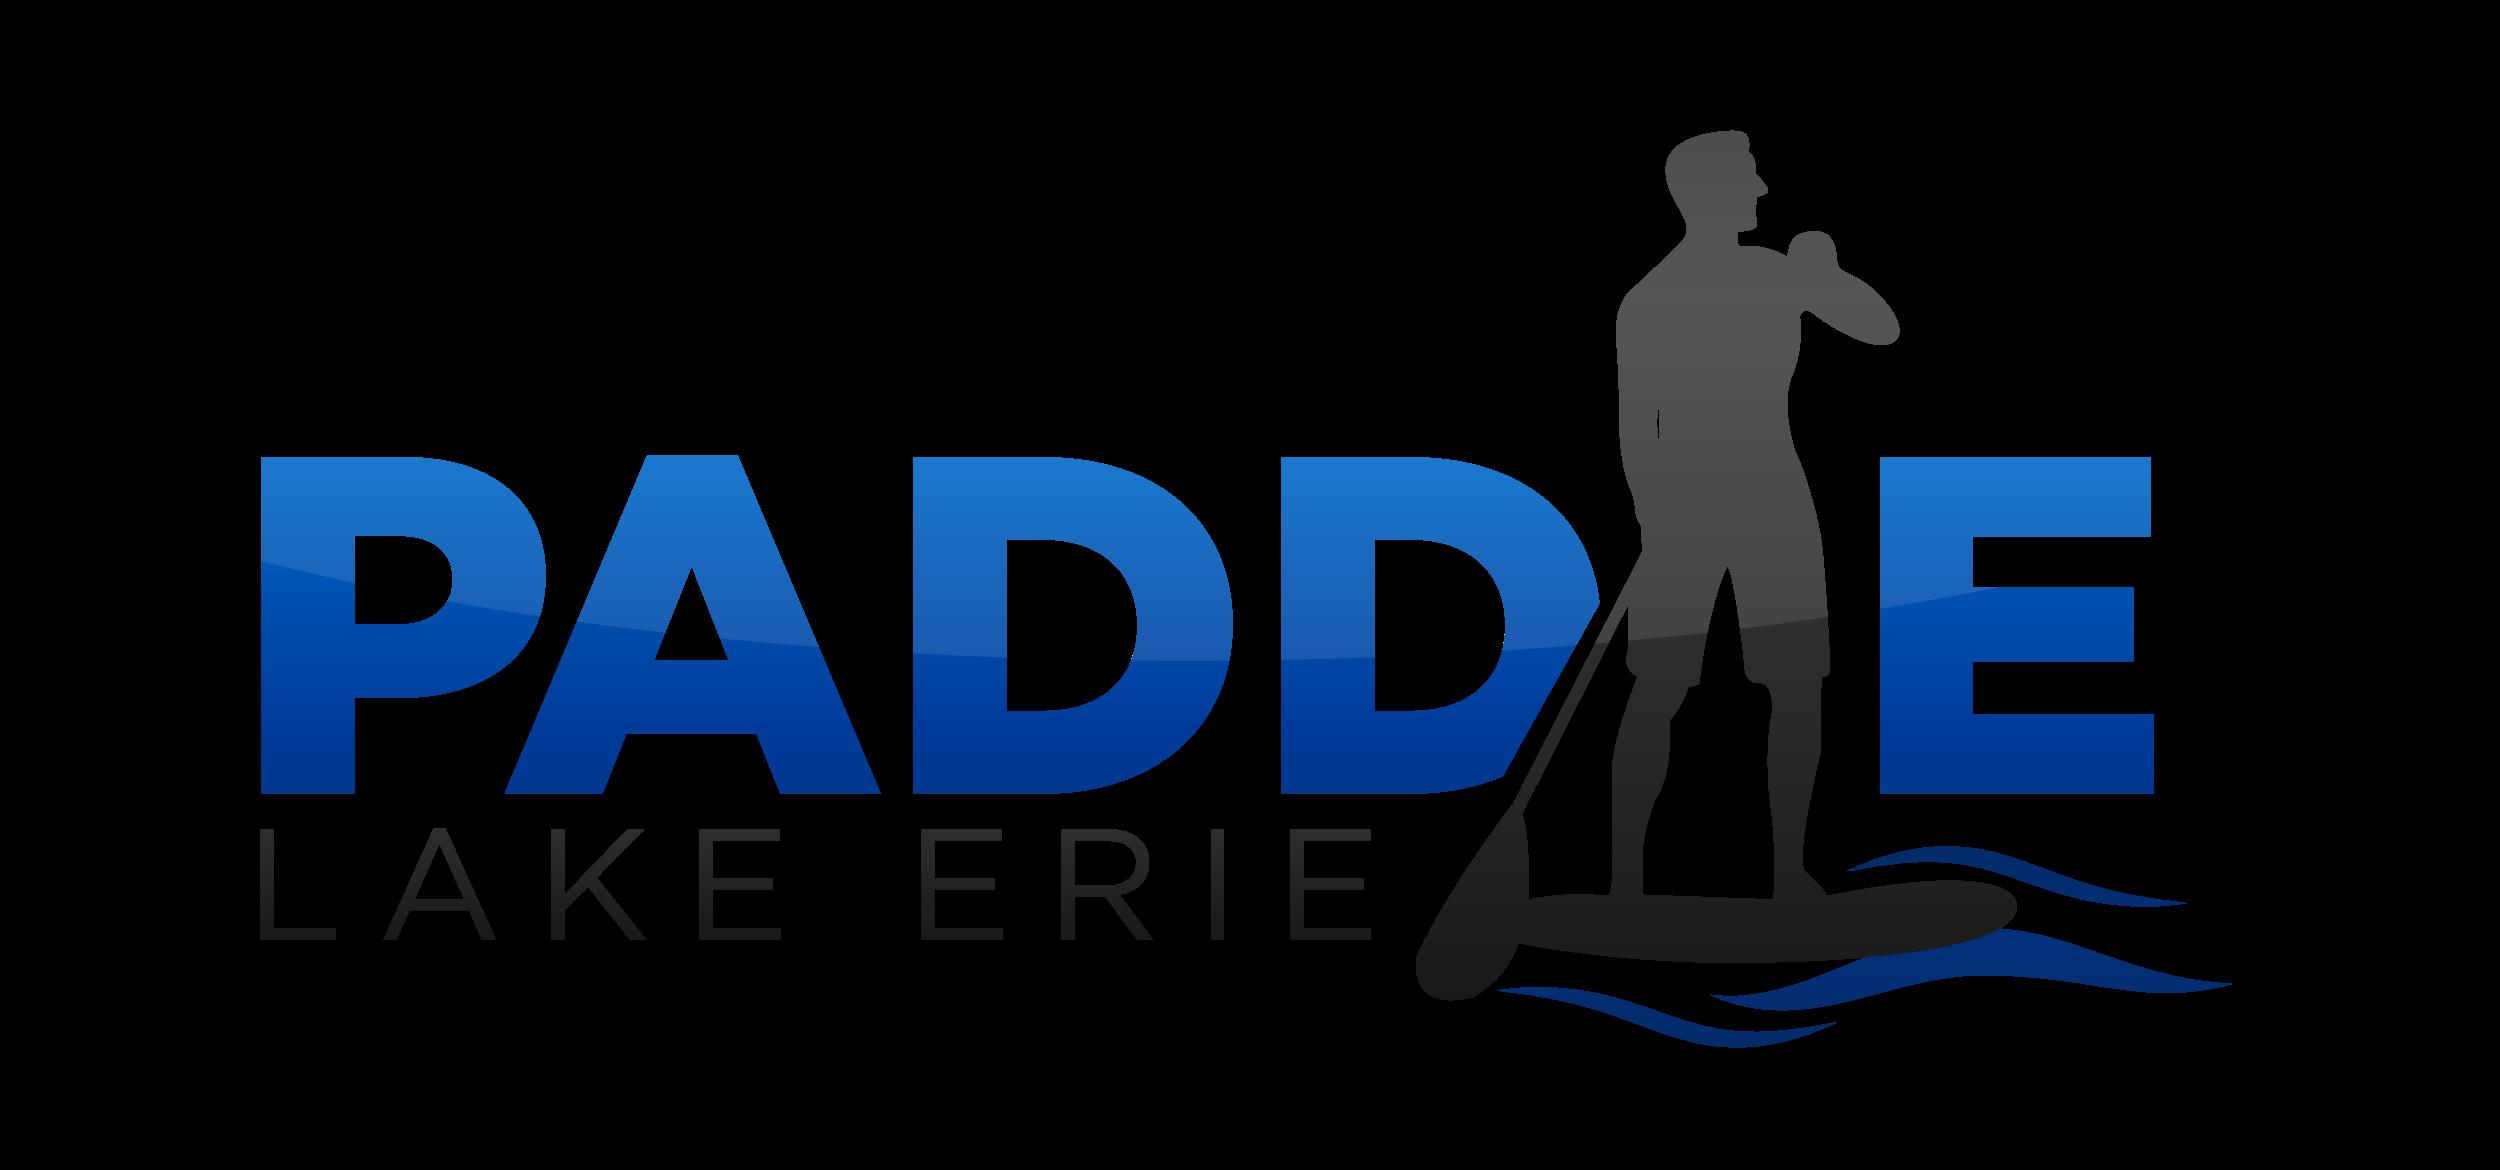 Paddle Lake Erie